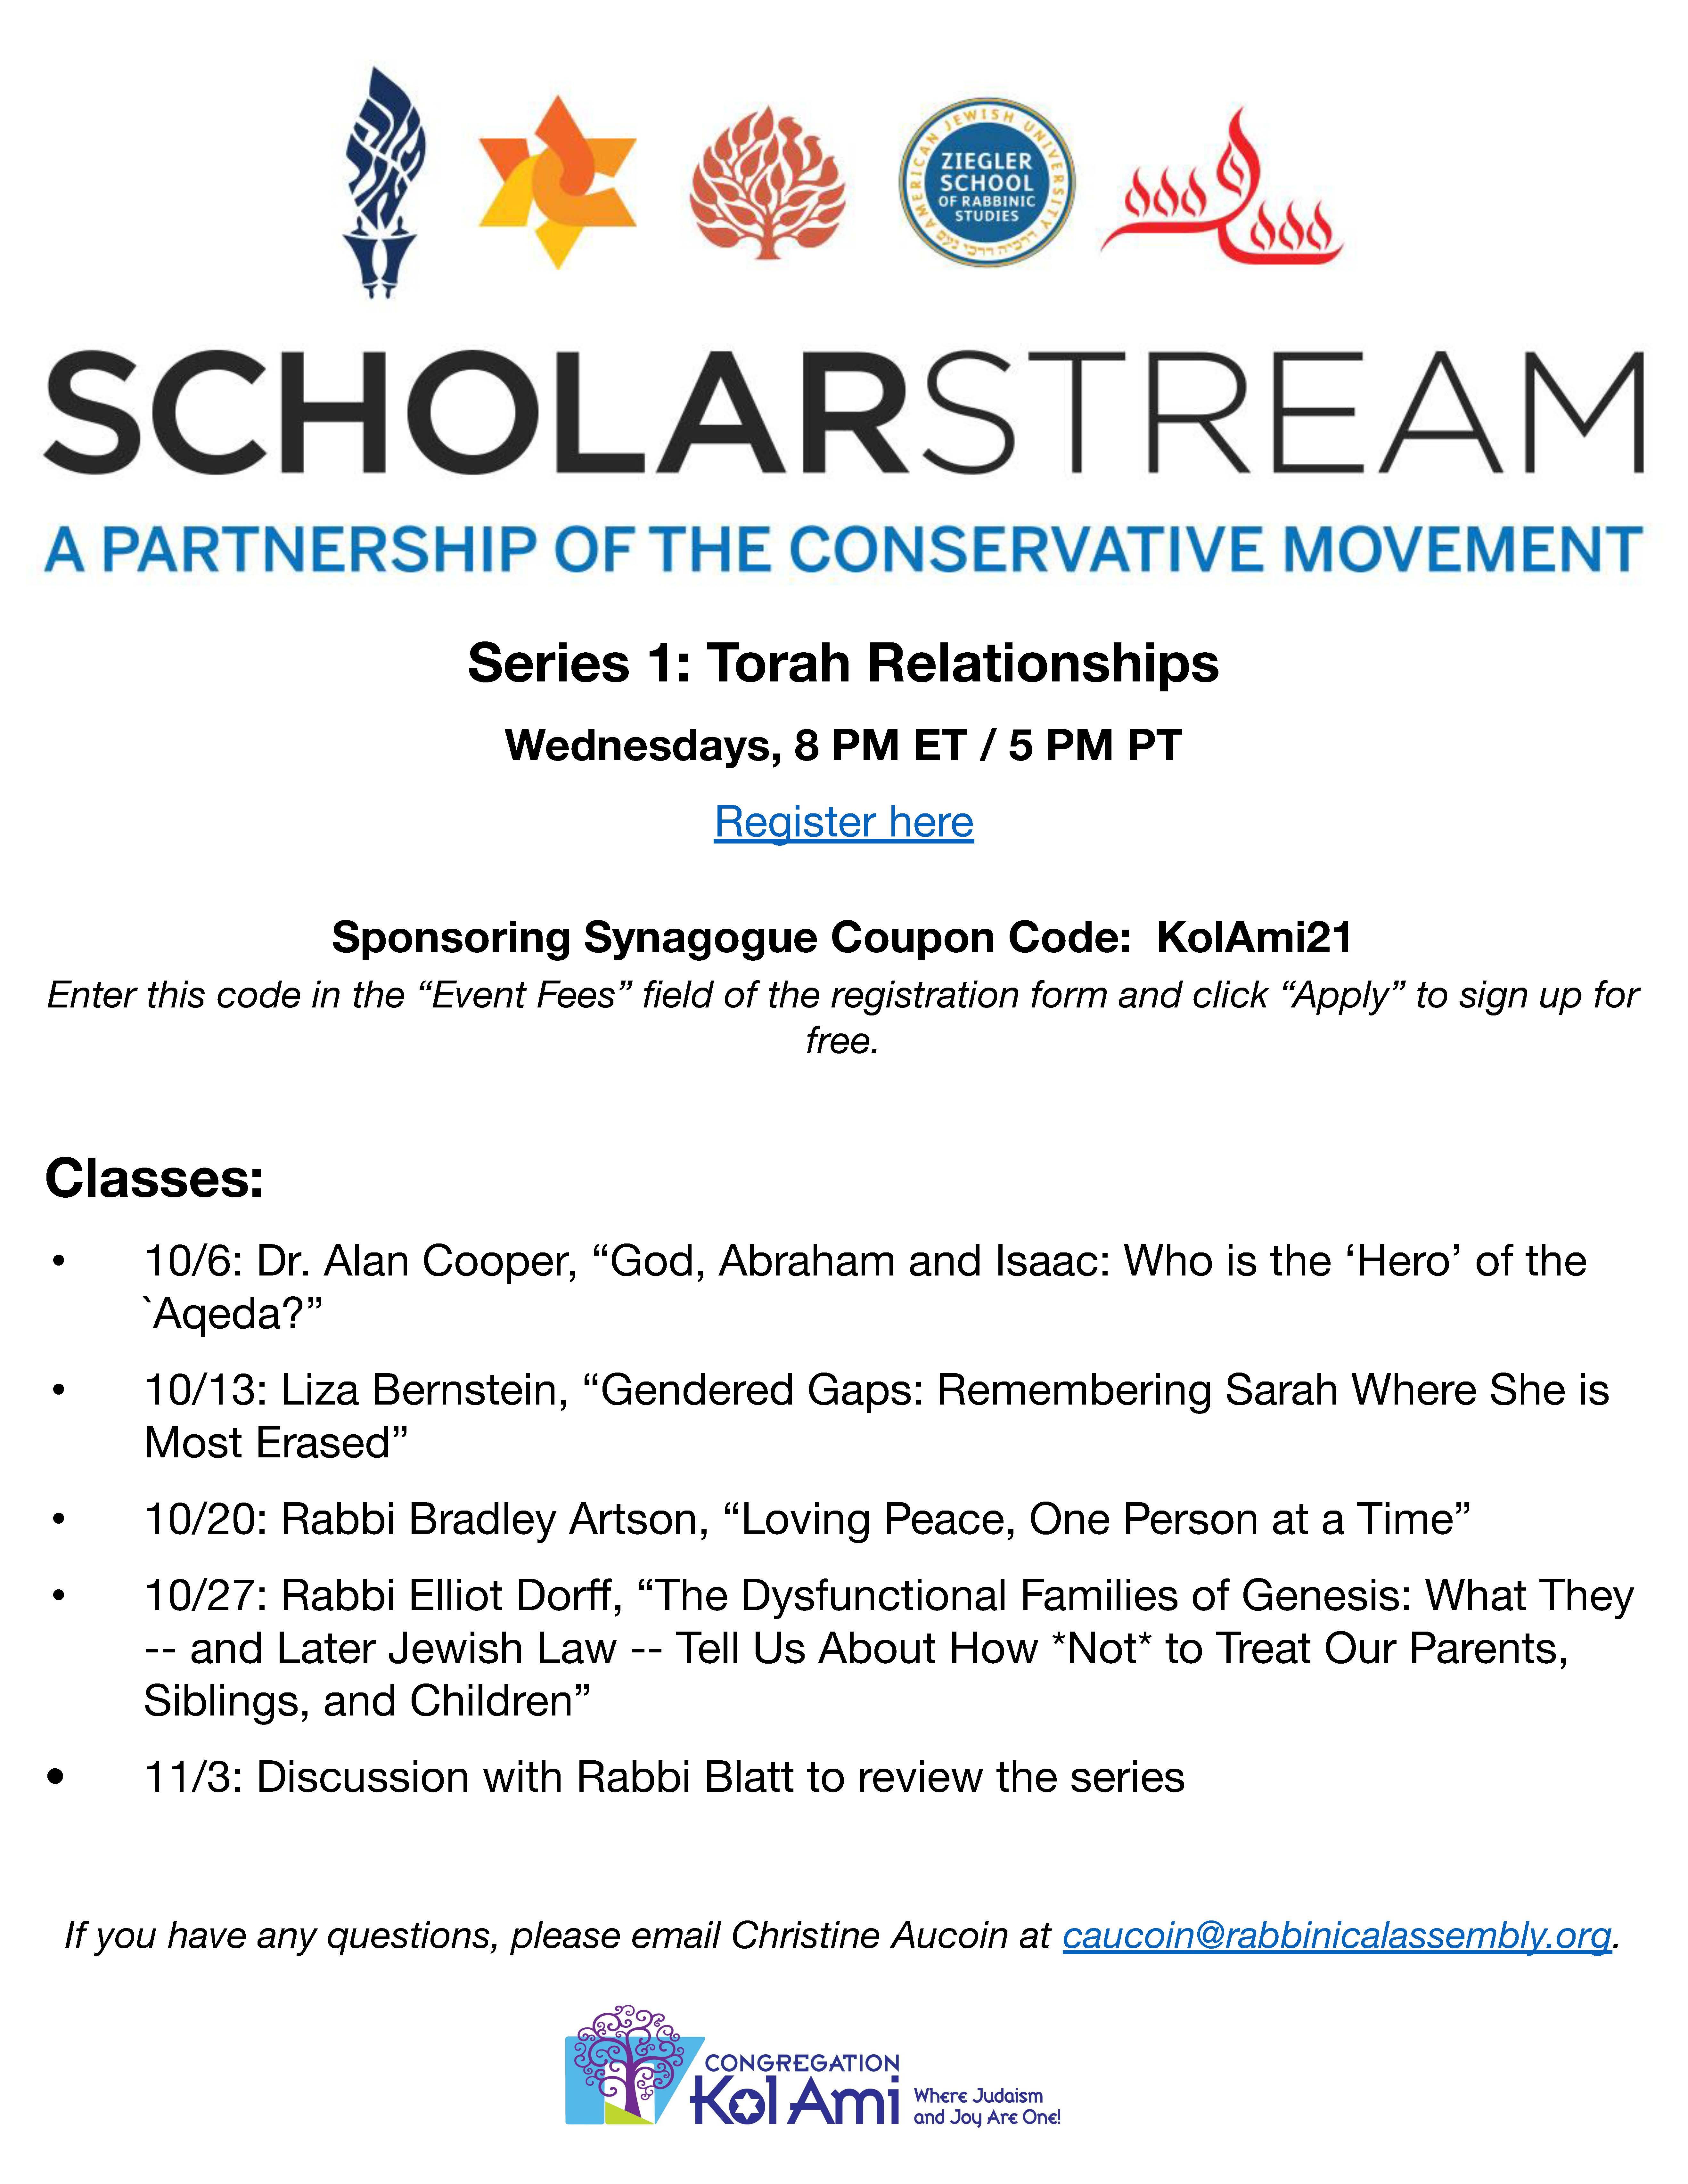 Banner Image for ScholarStream Program - Gendered Gaps: Remembering Sarah Where She is Most Erased